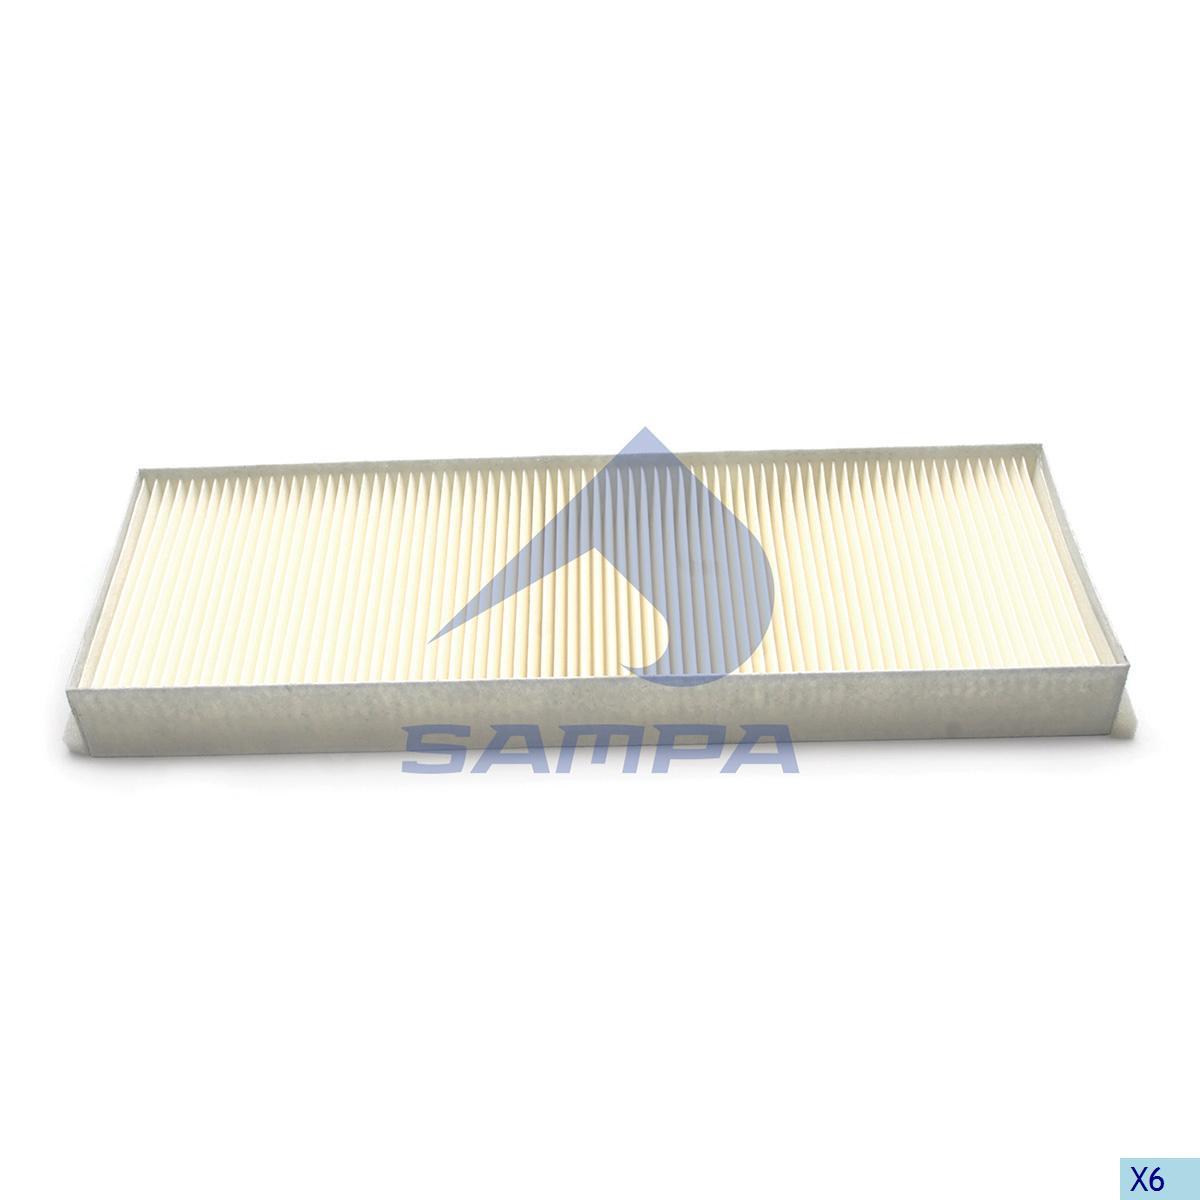 Filter, Cab Heating & Ventilation, Mercedes, Cab